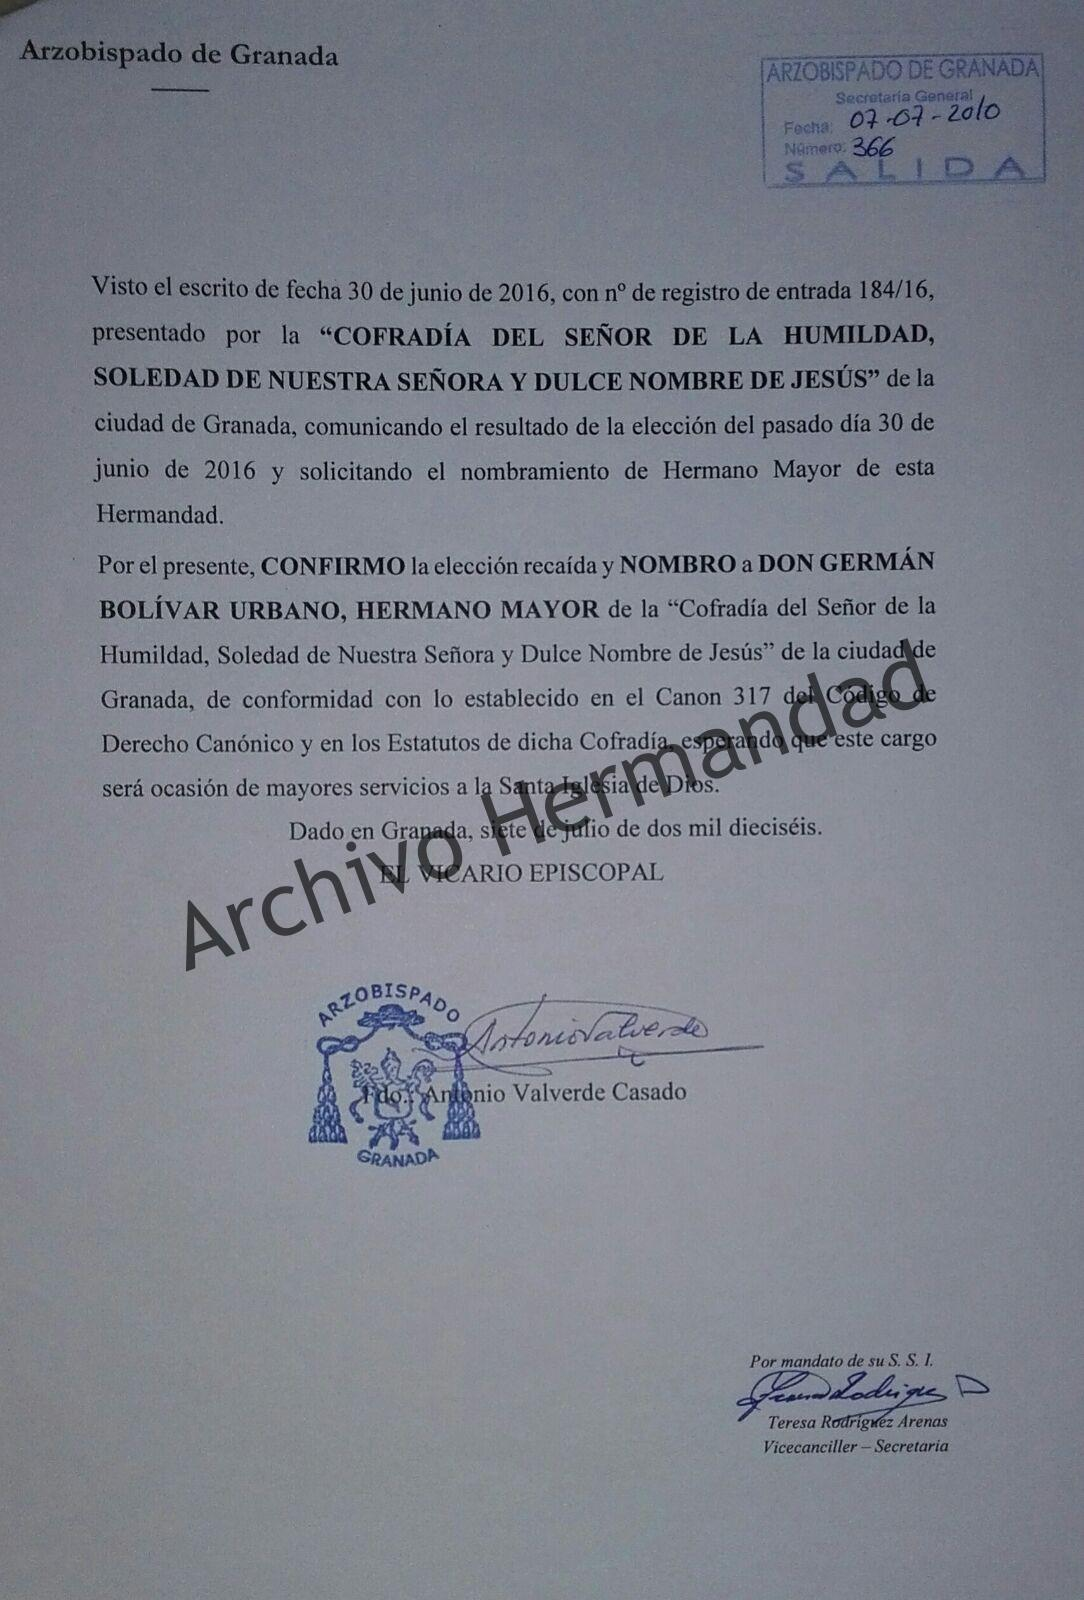 Ratificación Germán Bolívar Urbano